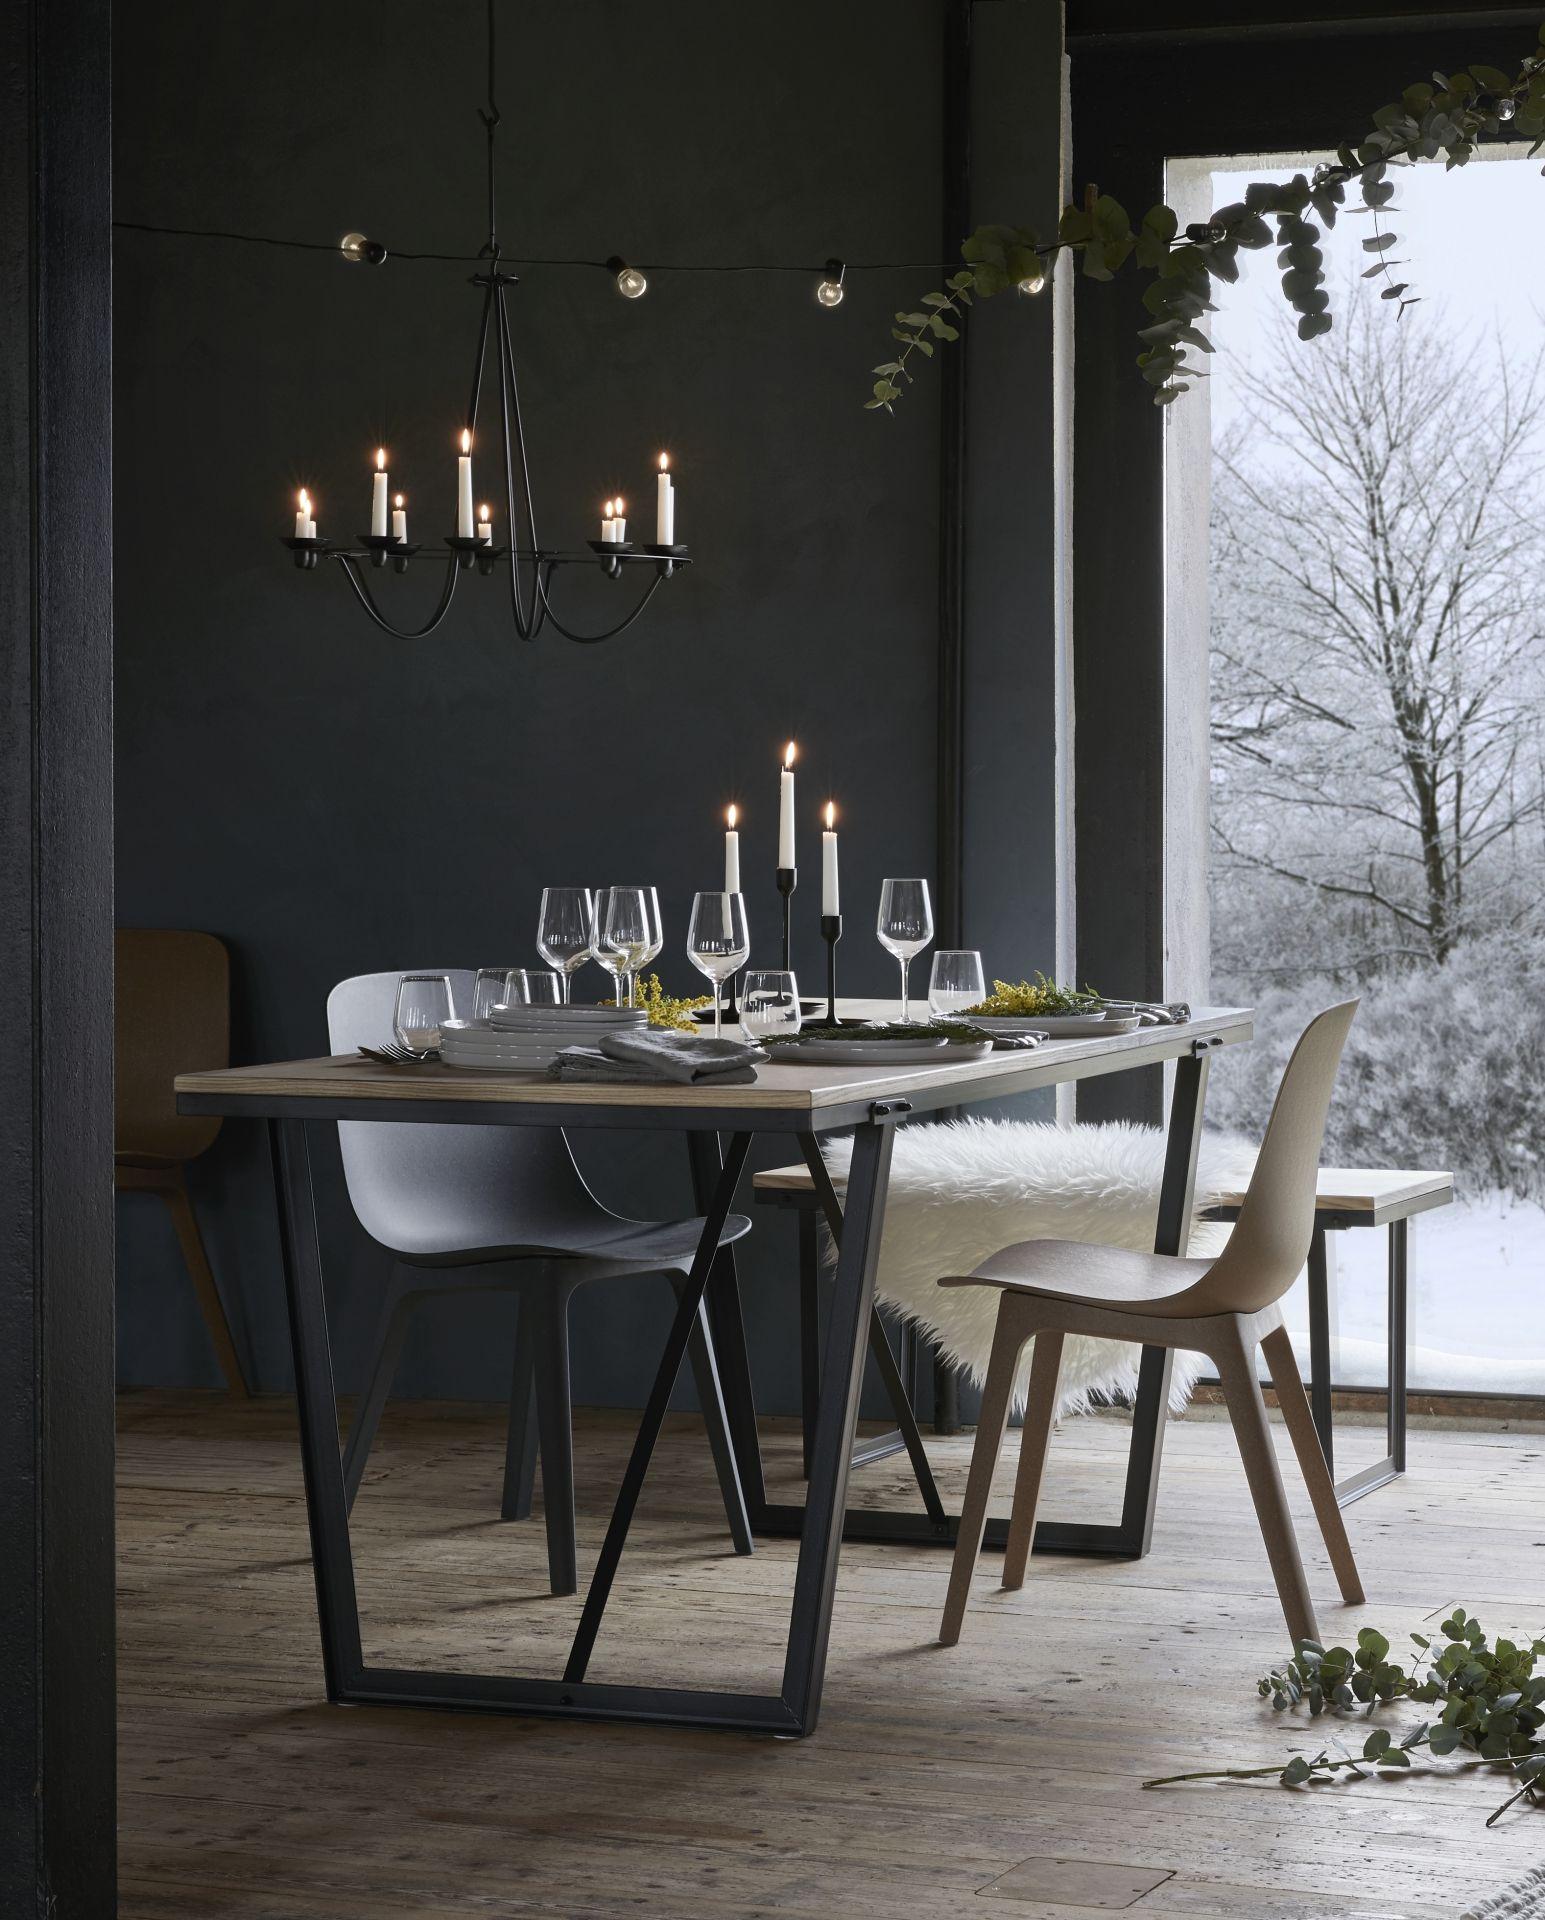 hemmakr kaarsenkroon ikea ikeanl ikeanederland winter herfst feestdagen cadeau gift cadeaus decoratie accessoire accessoires inspiratie interieur